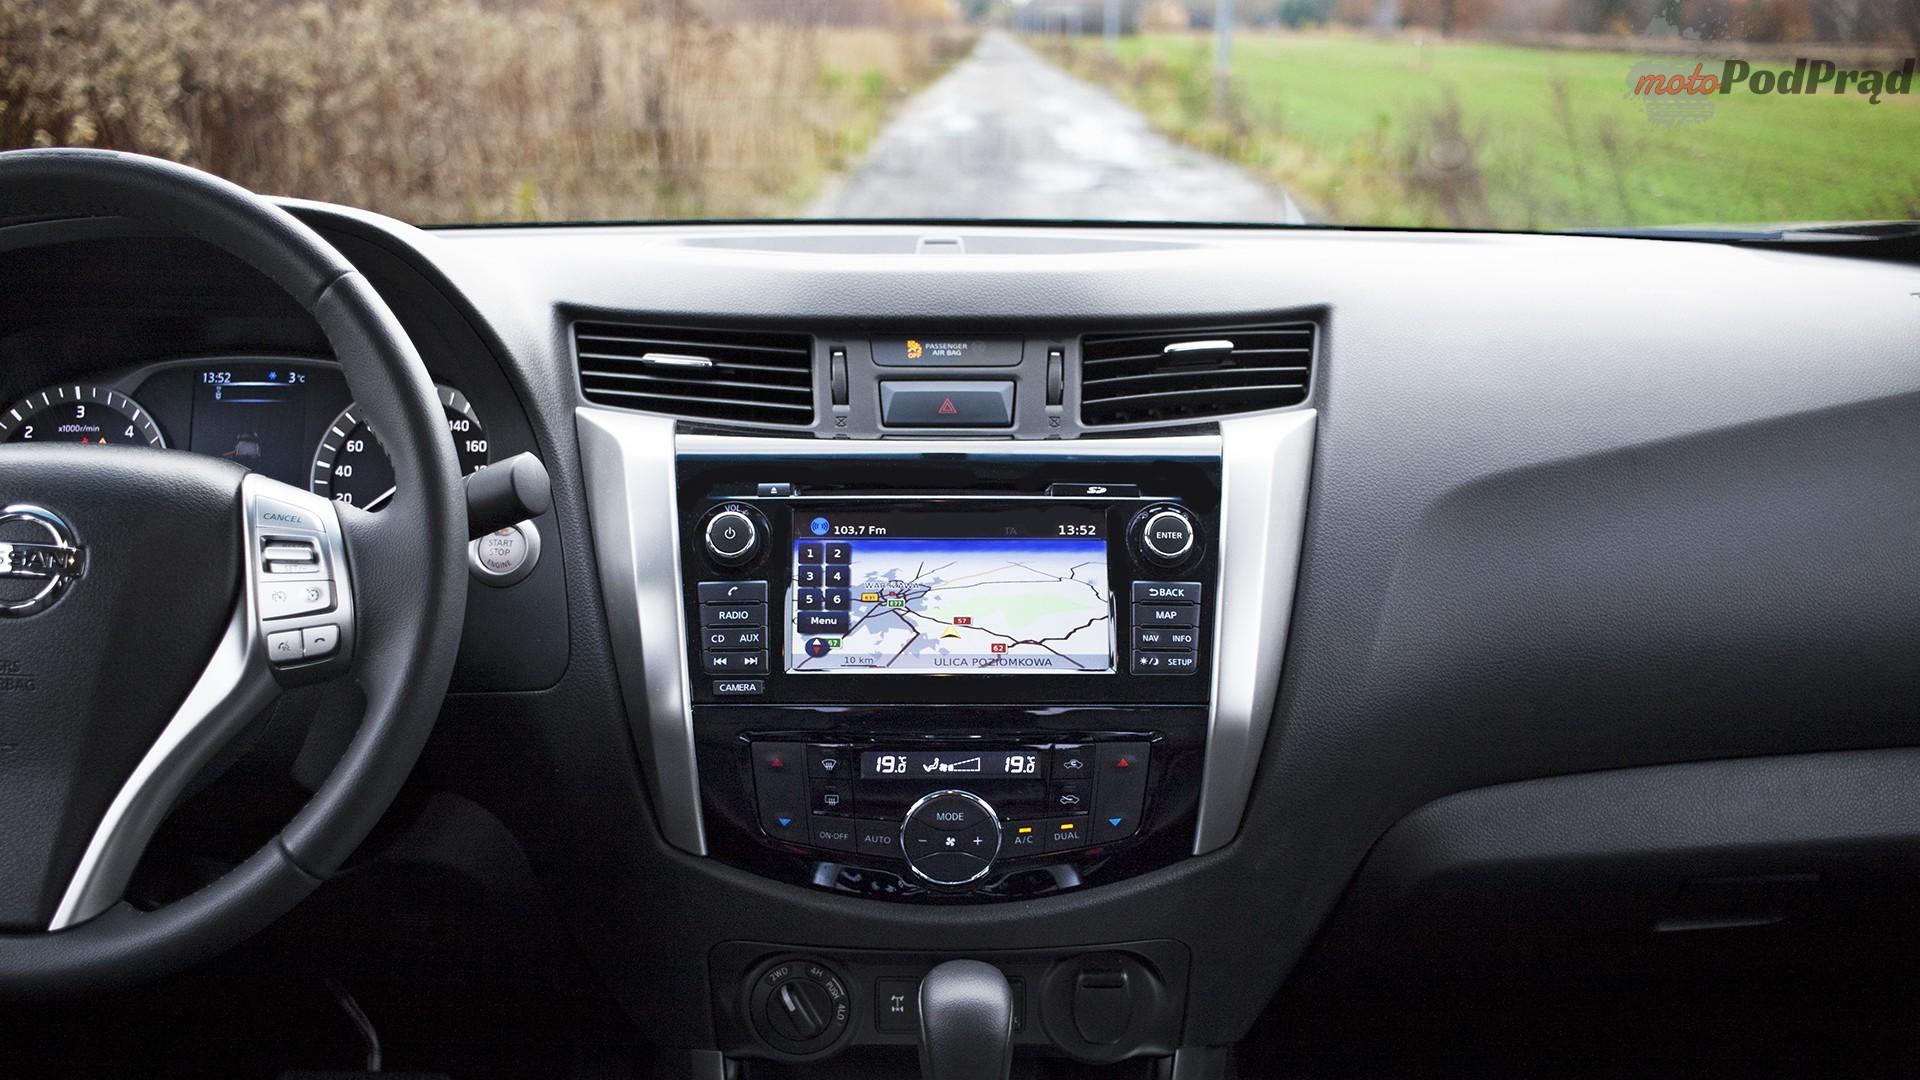 nissan navara kokpit Porównanie: Nissan Navara NP300 2.3 dCI kontra Mitsubishi L200 2.4D Monster